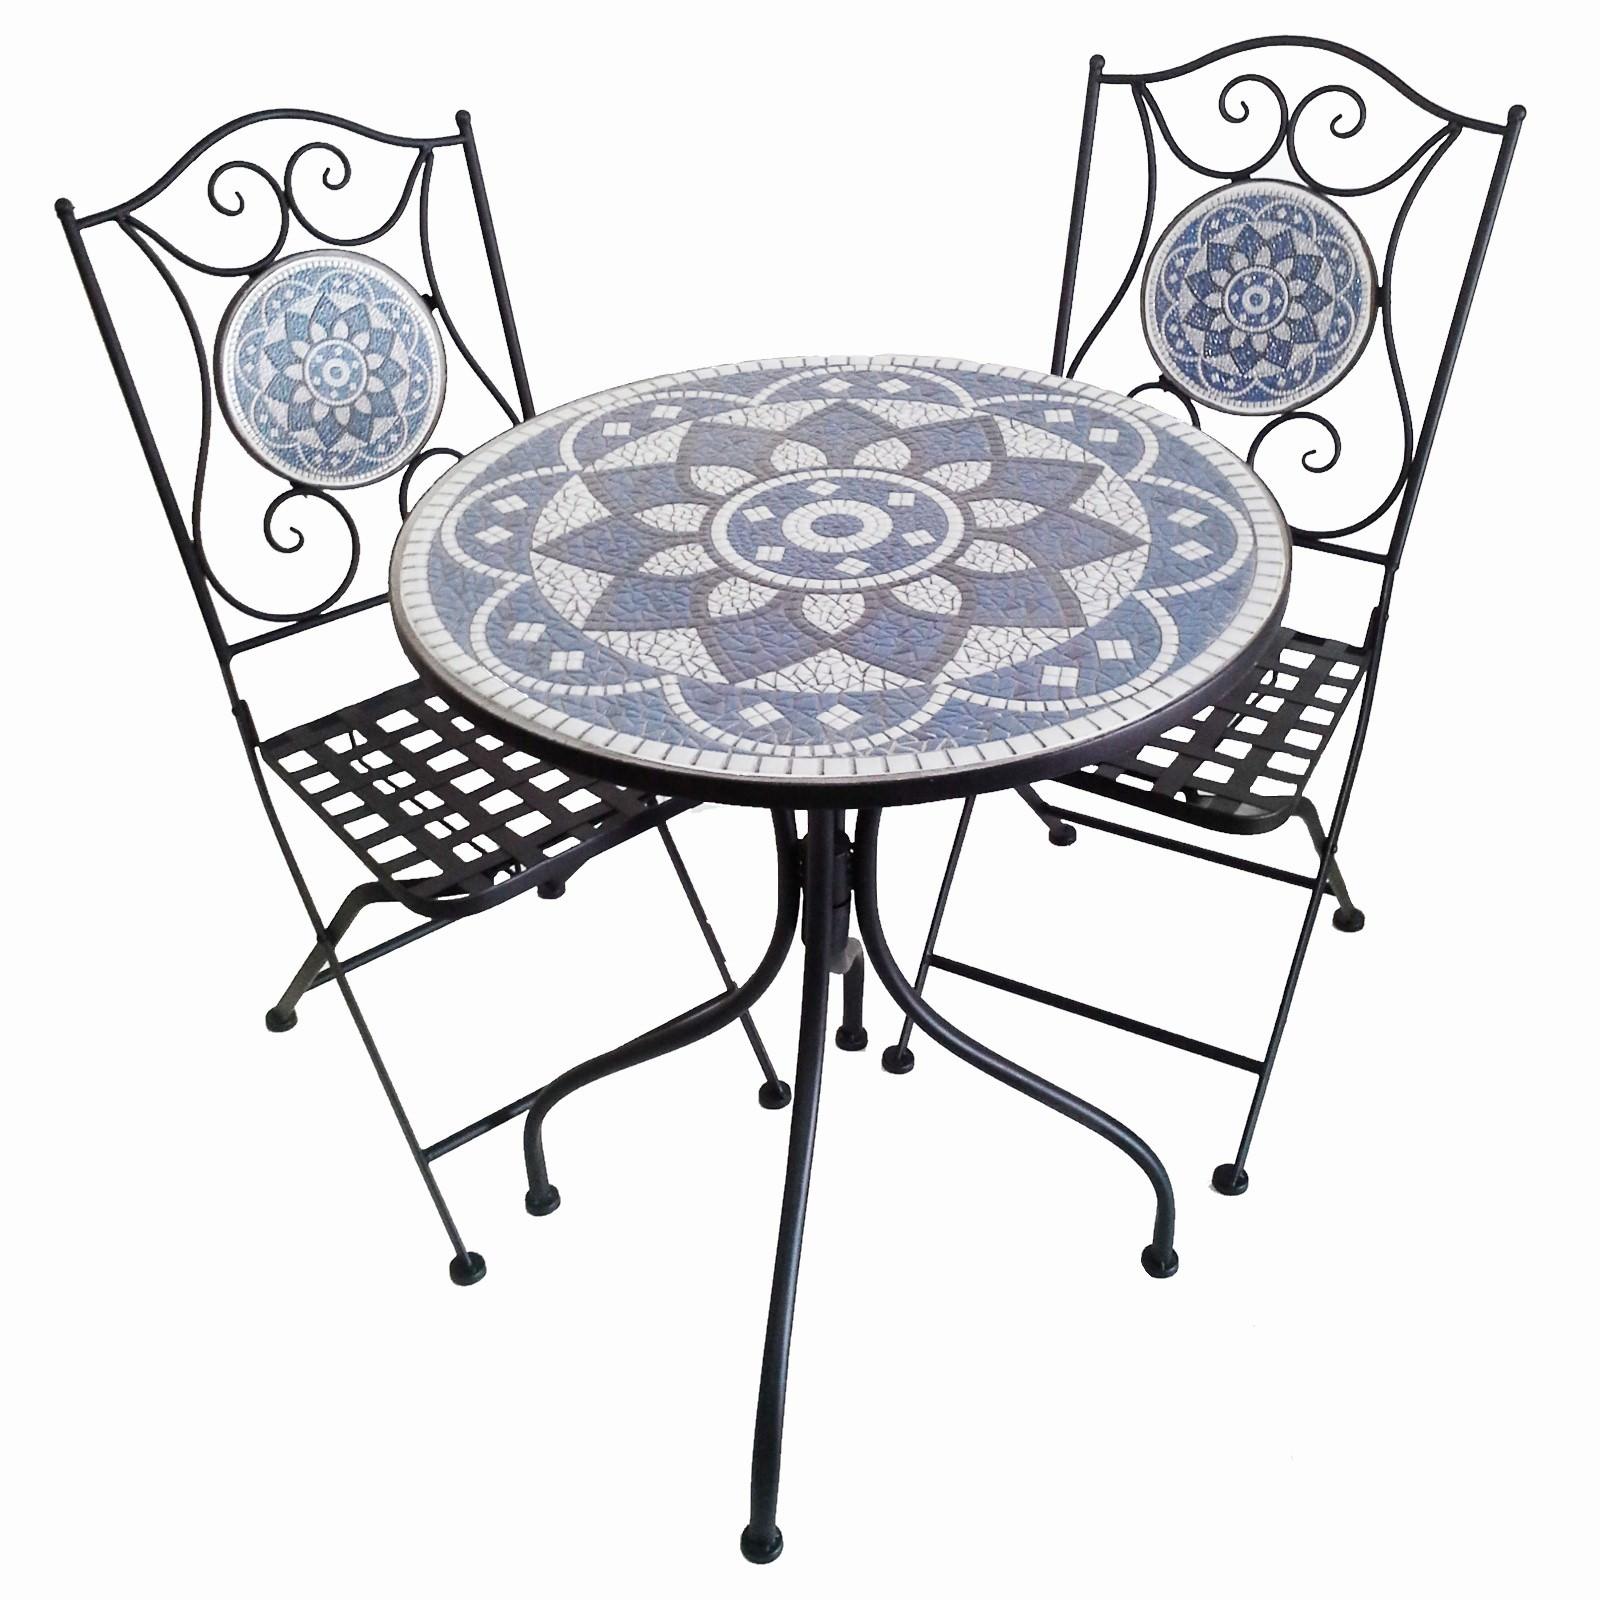 Belford 3 Piece Mosaic Metal Balcony Table & Chair Set